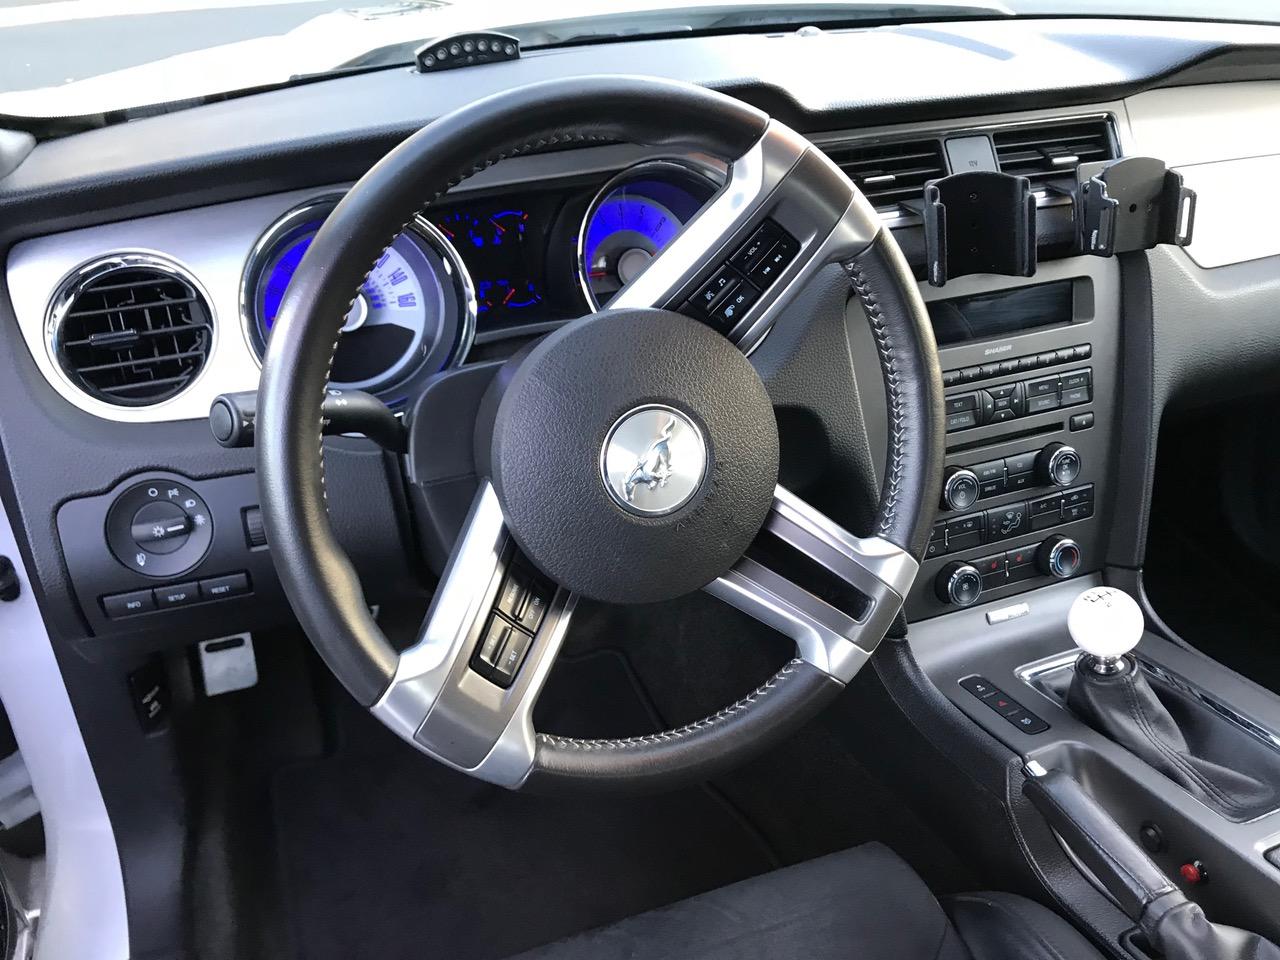 z car blog 2012 mustang gt premium w vortech supercharger rh zcarblog com 2018 Mustang GT Auto Transmission Mustang GT 2005 2009 Transmission Diagram